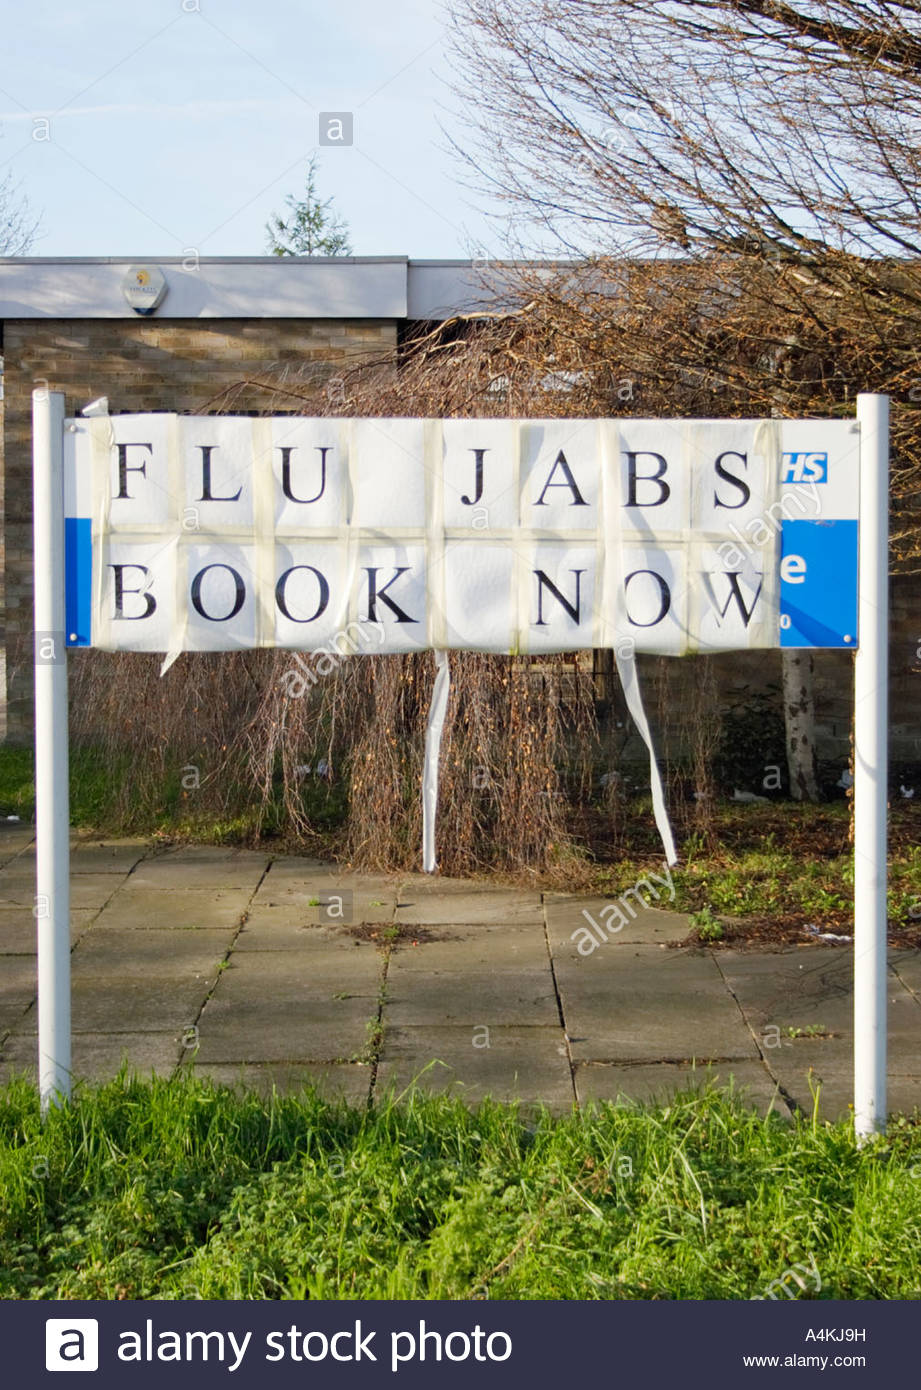 Flu jab sign. - Stock Image